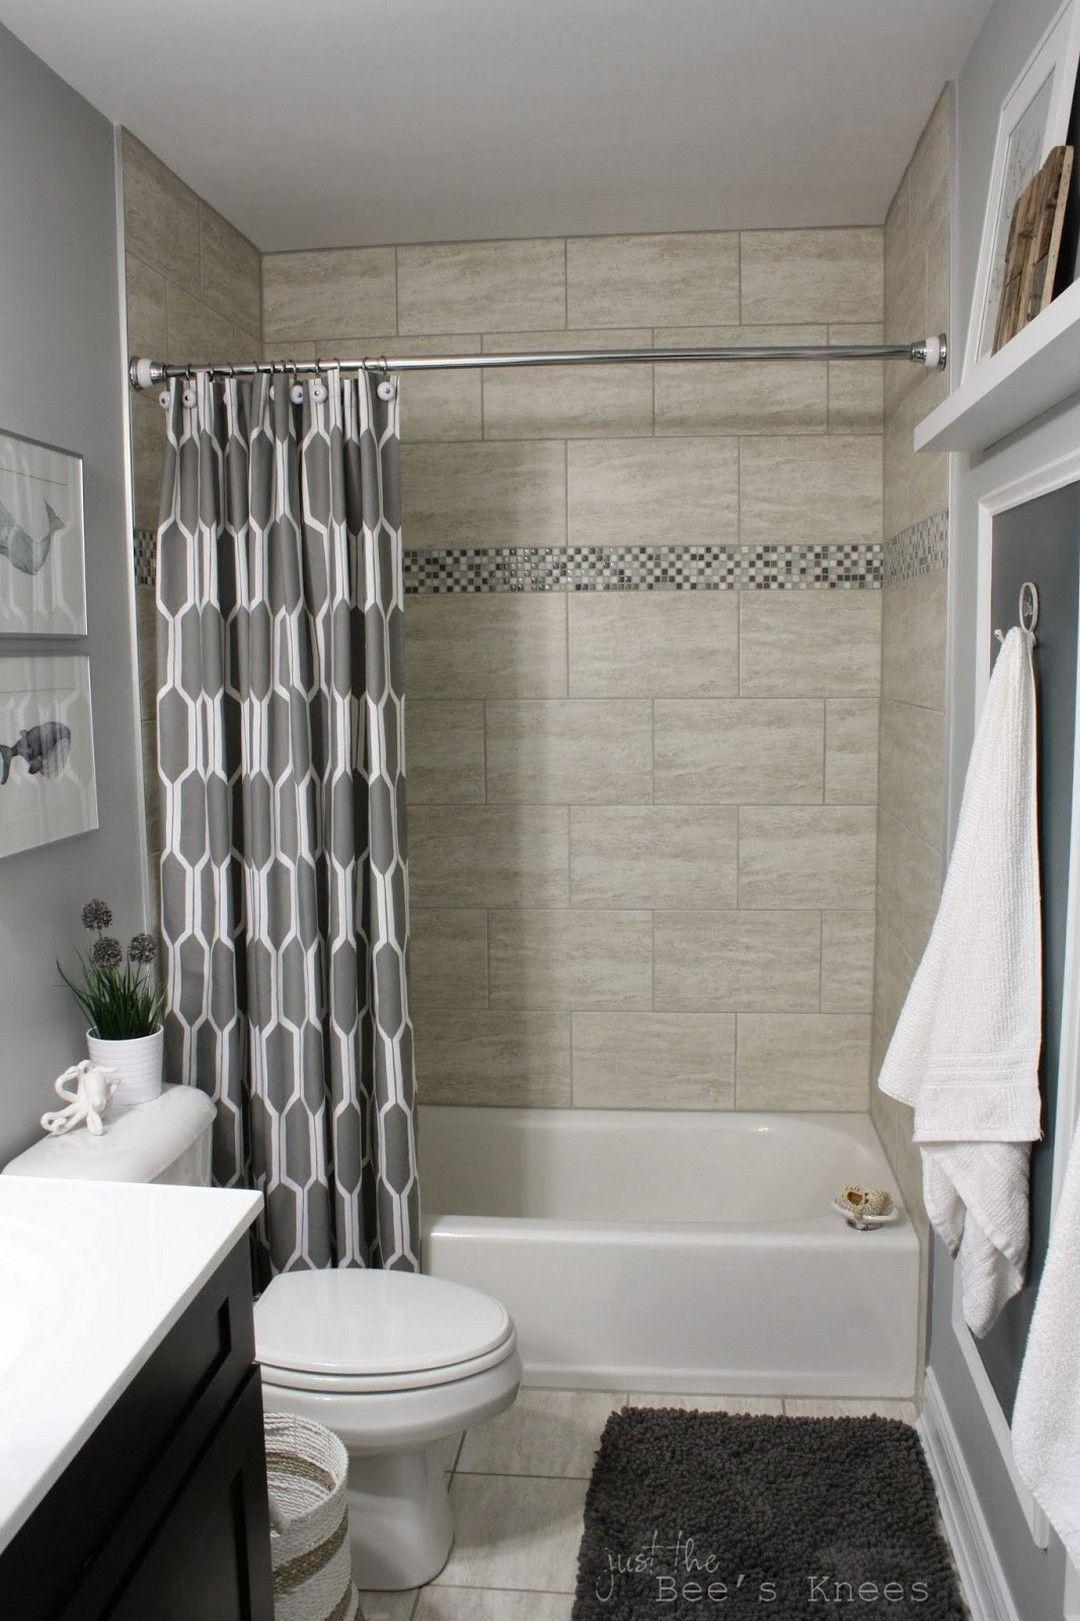 Low Ceiling Basement Bathroom 1. Guest Bathroom 1